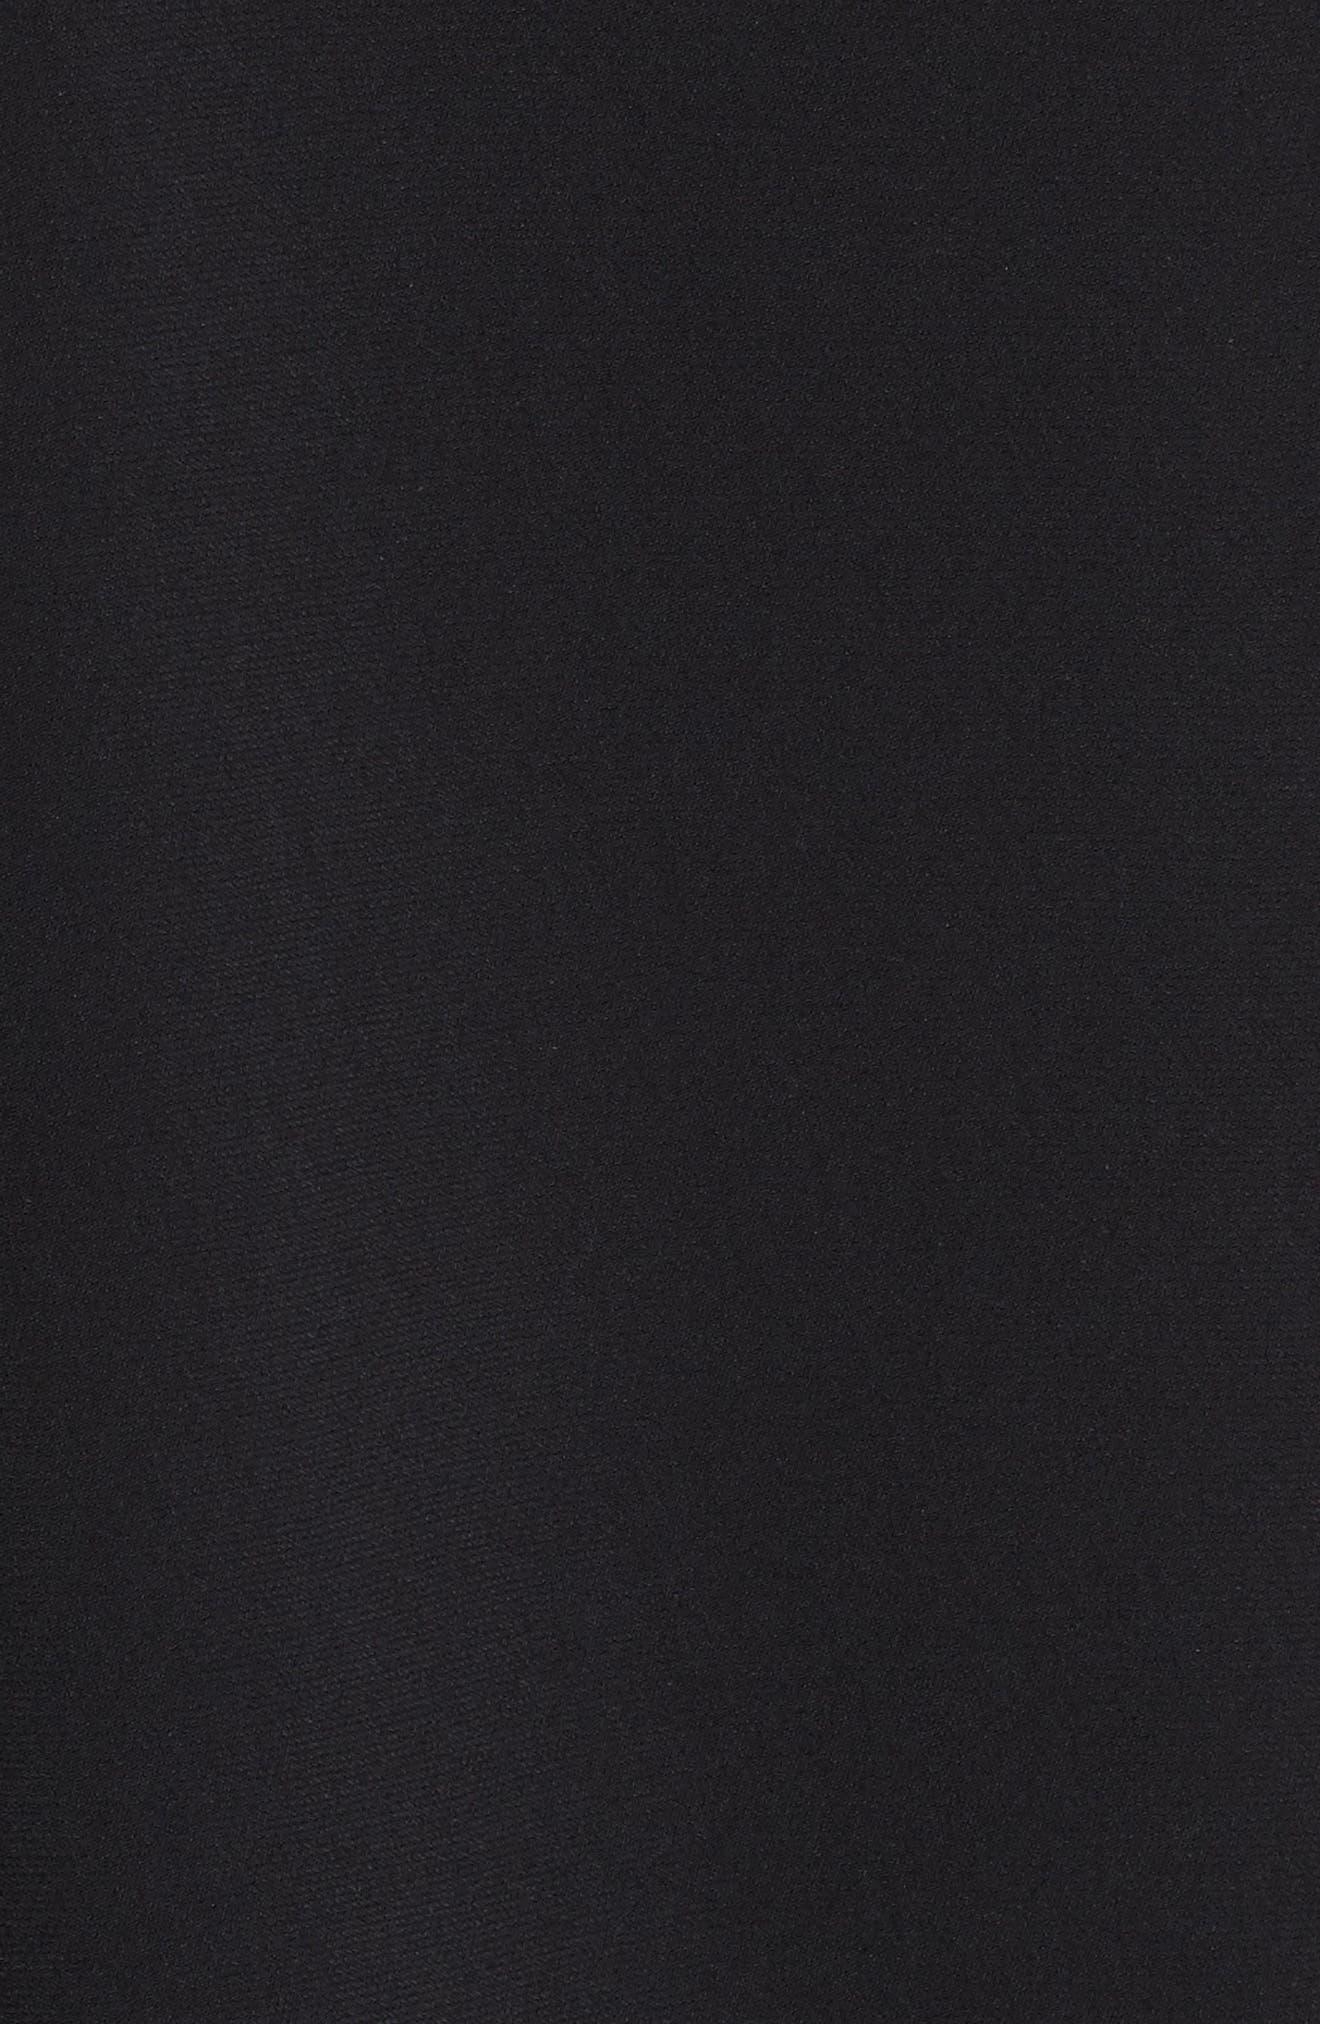 Alternate Image 3  - Stella McCartney Stretch Cady One-Shoulder Cape Gown